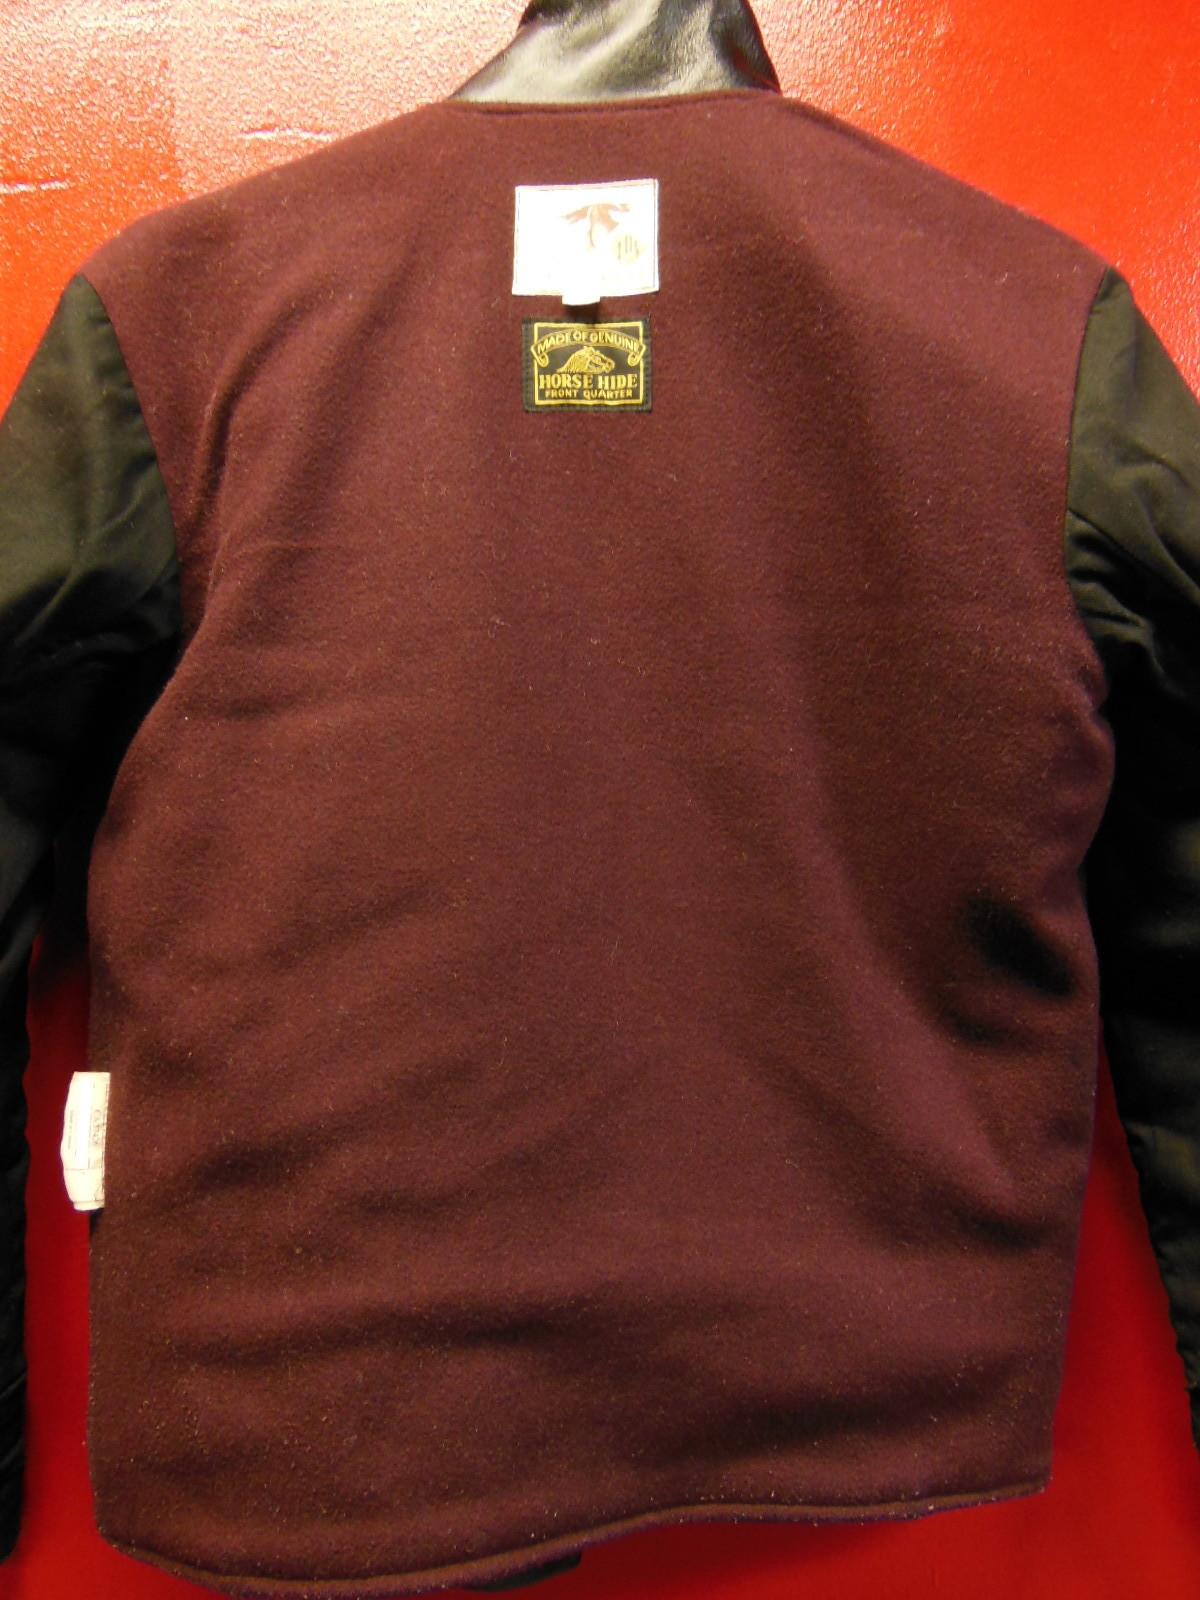 USED HIMEL BROTHERS LEATHER HERON 1929/新喜皮革製黒ホースハイド/SIZE-36/ボタンフロント A-1 ジャケット_c0187684_15062226.jpg